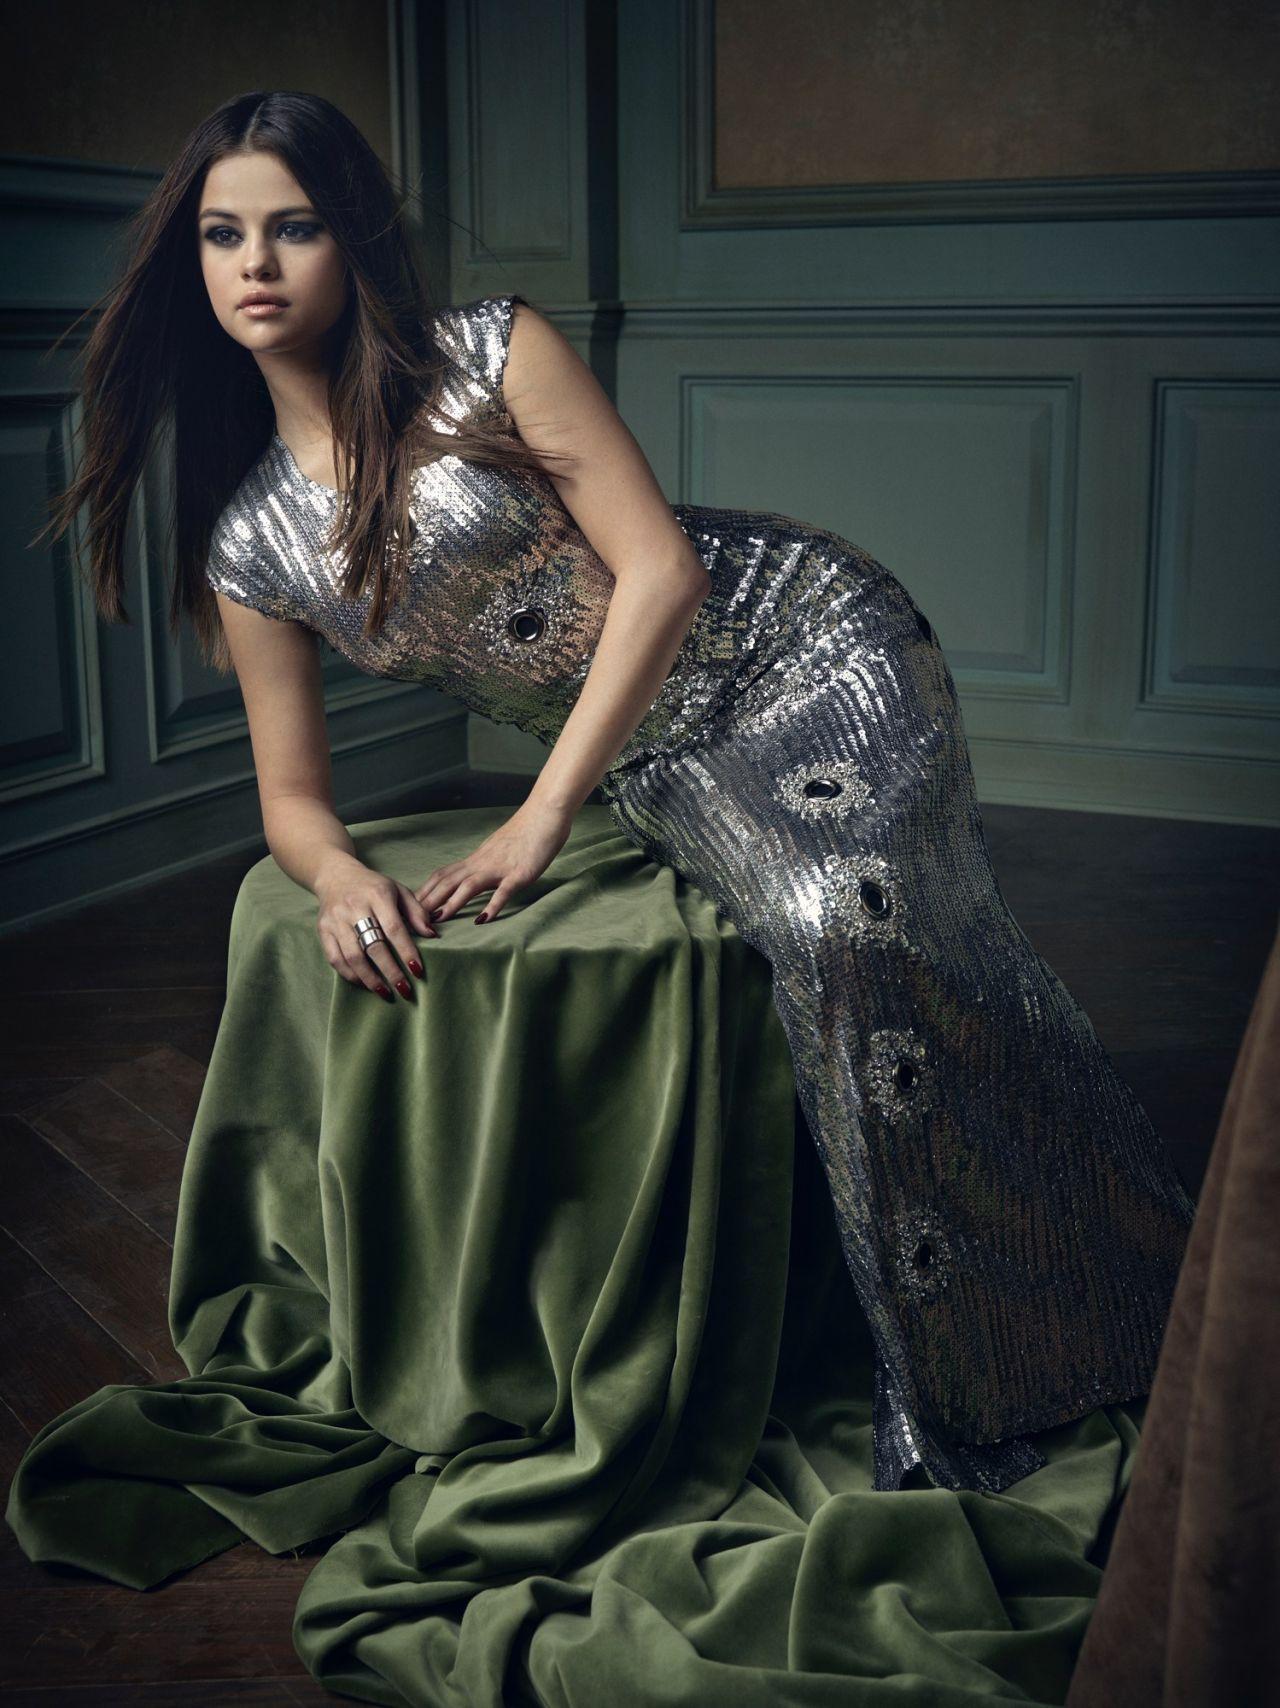 Selena Gomez 2016 Vanity Fair Oscar Party Portrait Celebmafia